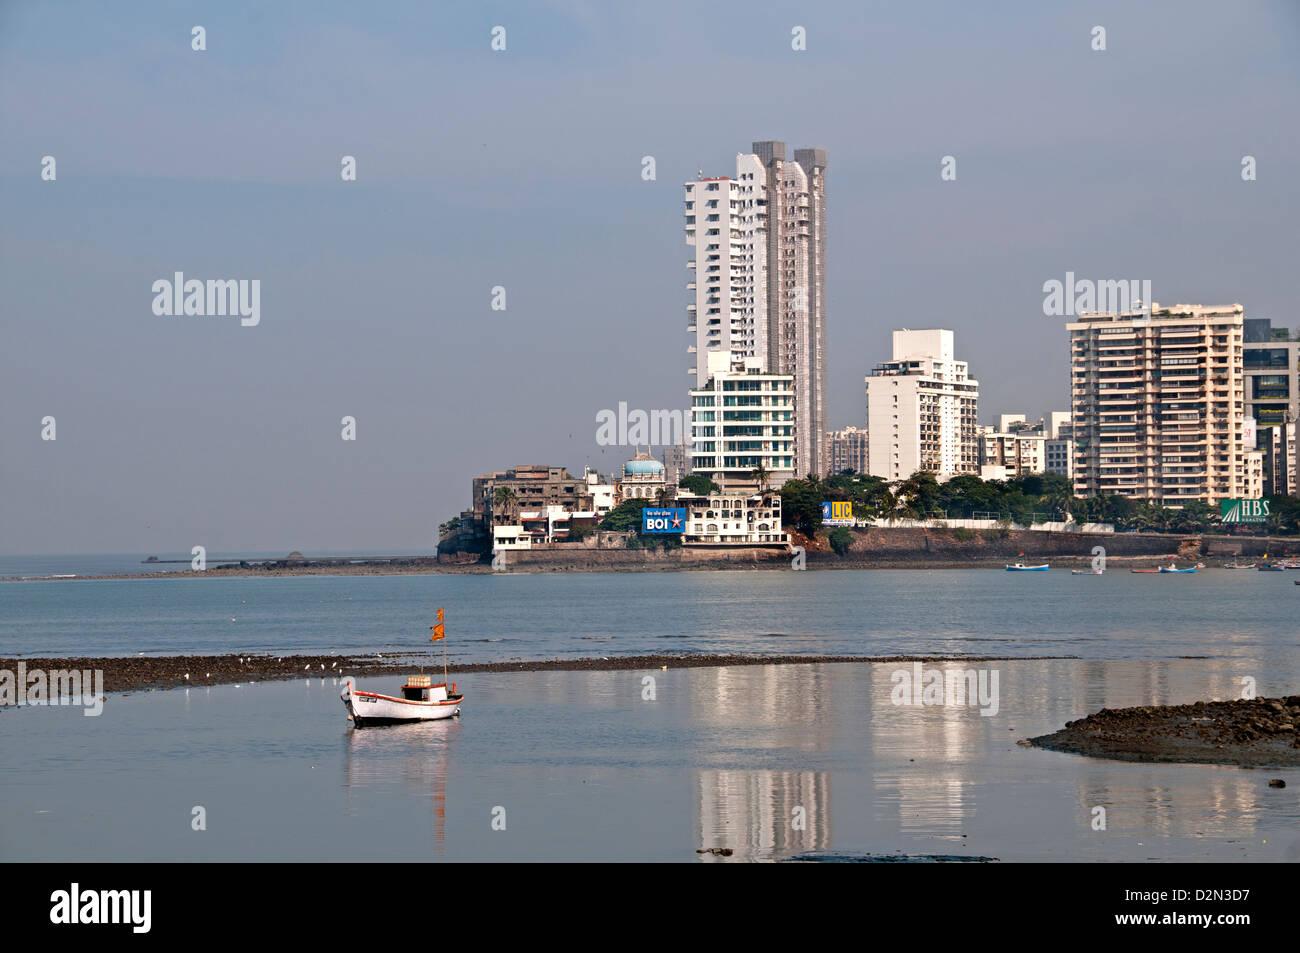 Los suburbios Bandra, Mumbai (Bombay, India ) la arquitectura moderna de la bahía enfrente de la Mezquita Haji Imagen De Stock